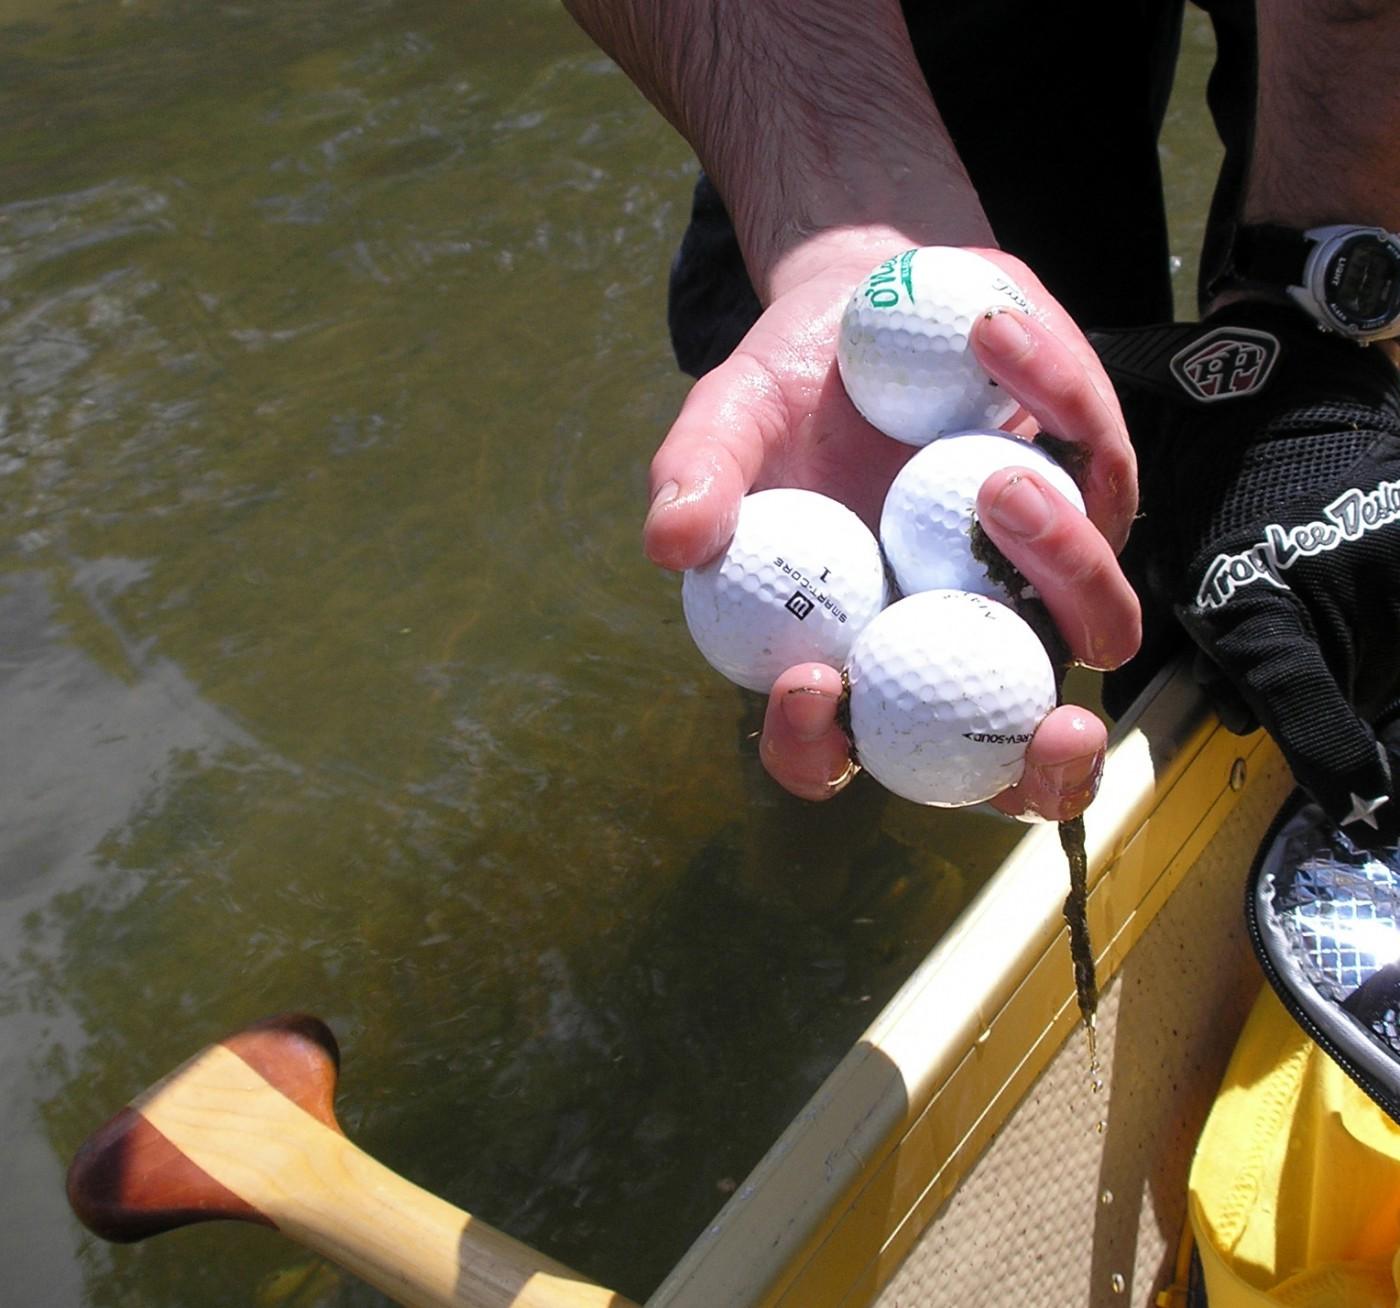 Michael Brown, </span><span><em>Fetching Golf Balls from Black Creek, 2008</em>, </span><span>Photograph